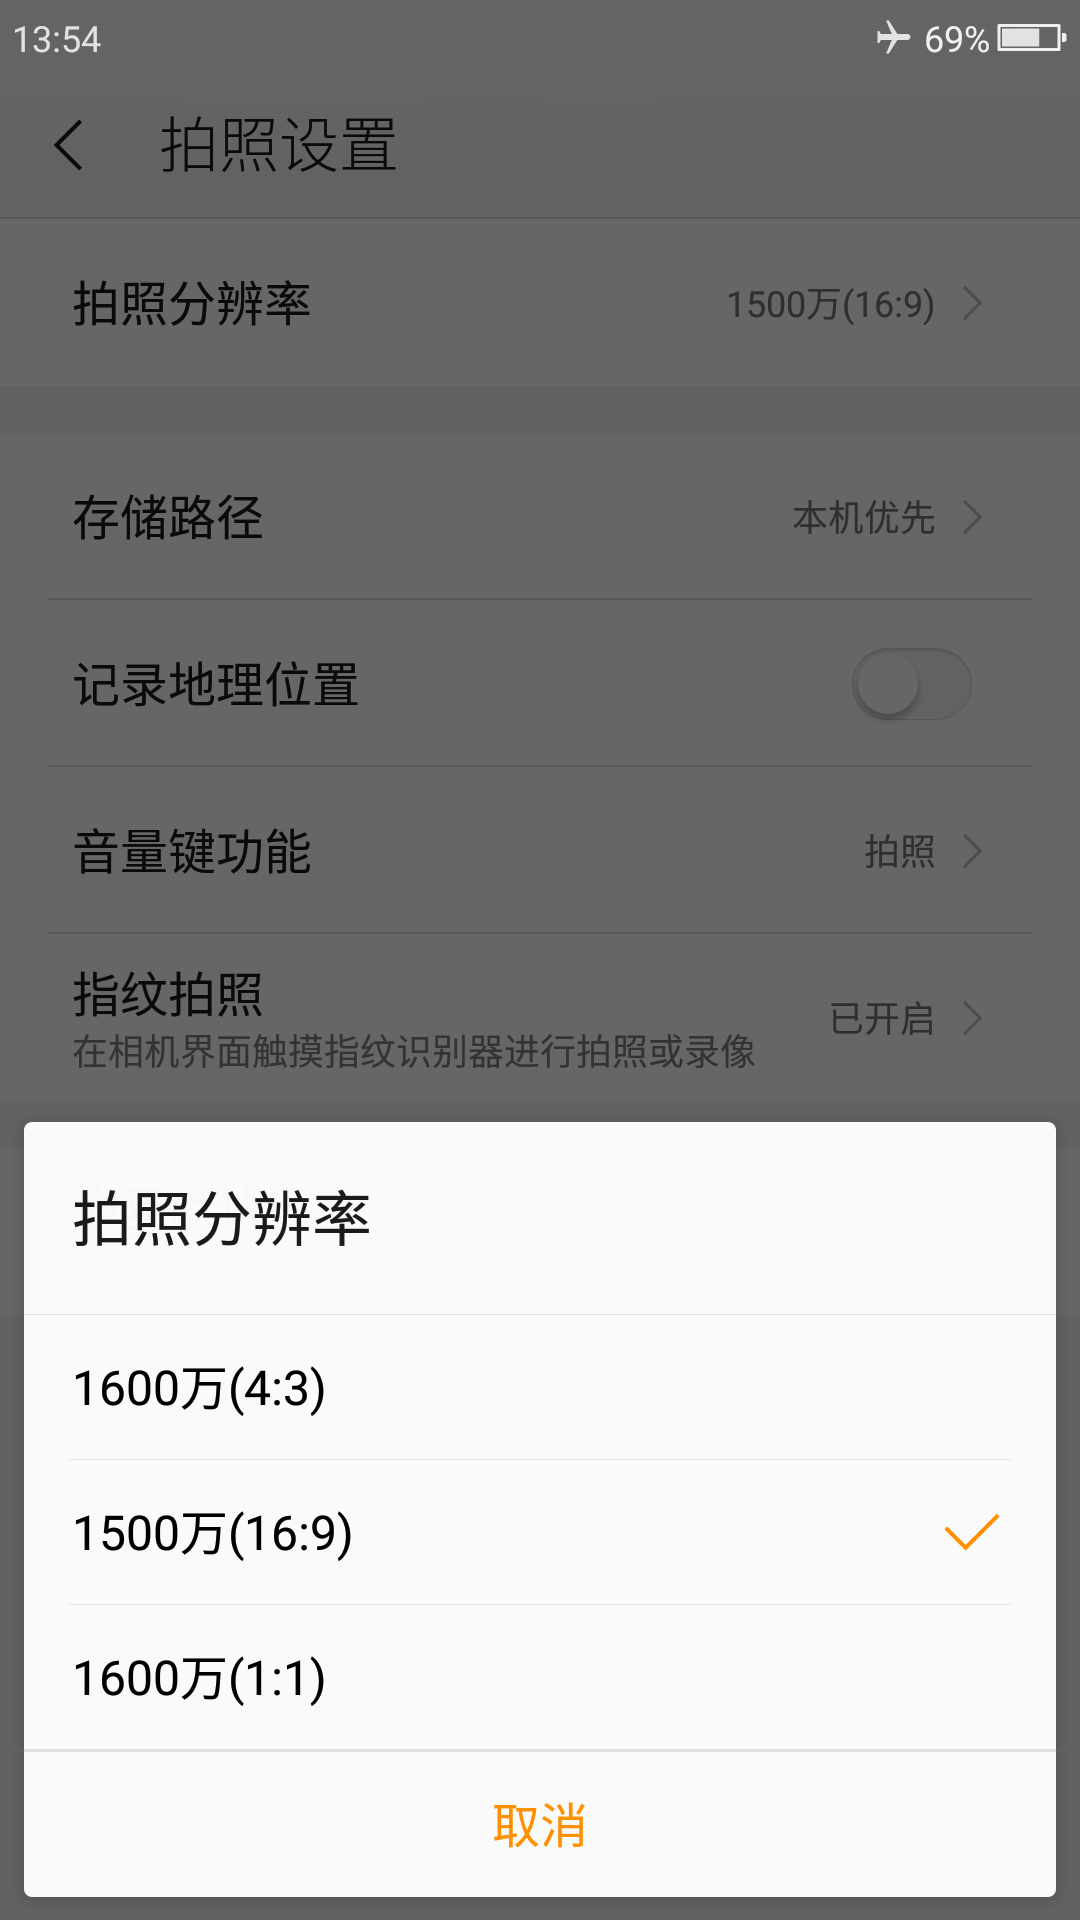 Screenshot_2018-06-18-13-54-20.png